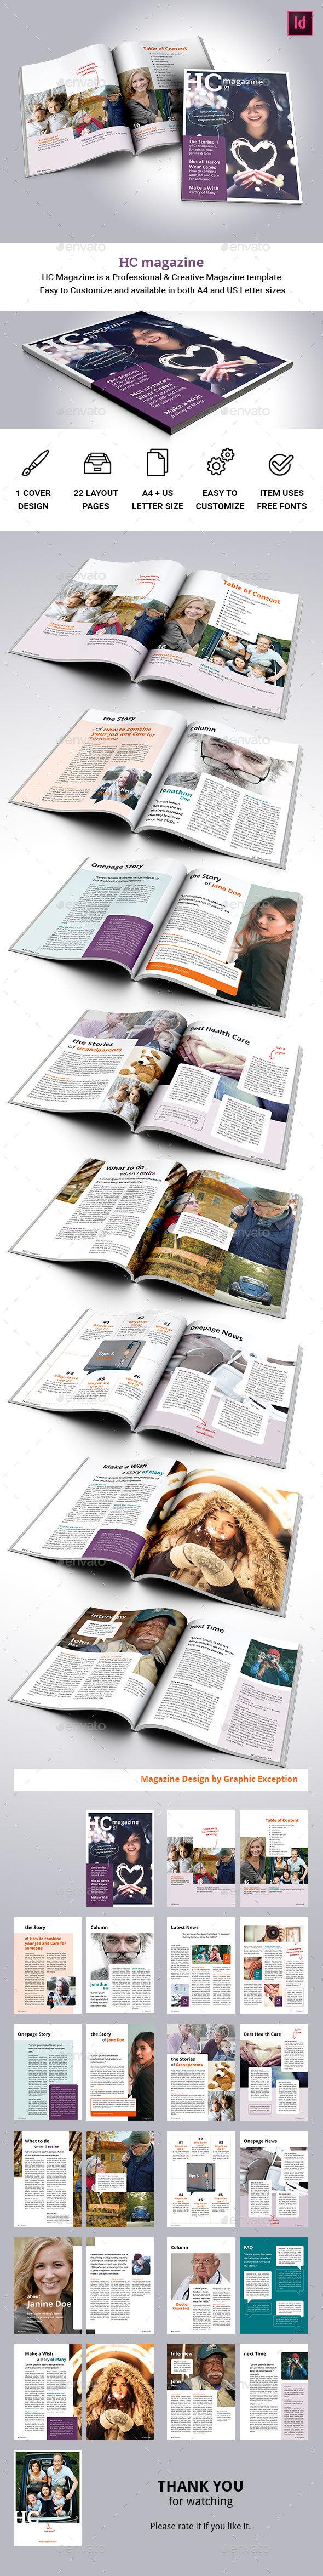 HC Magazine - Magazines Print Templates